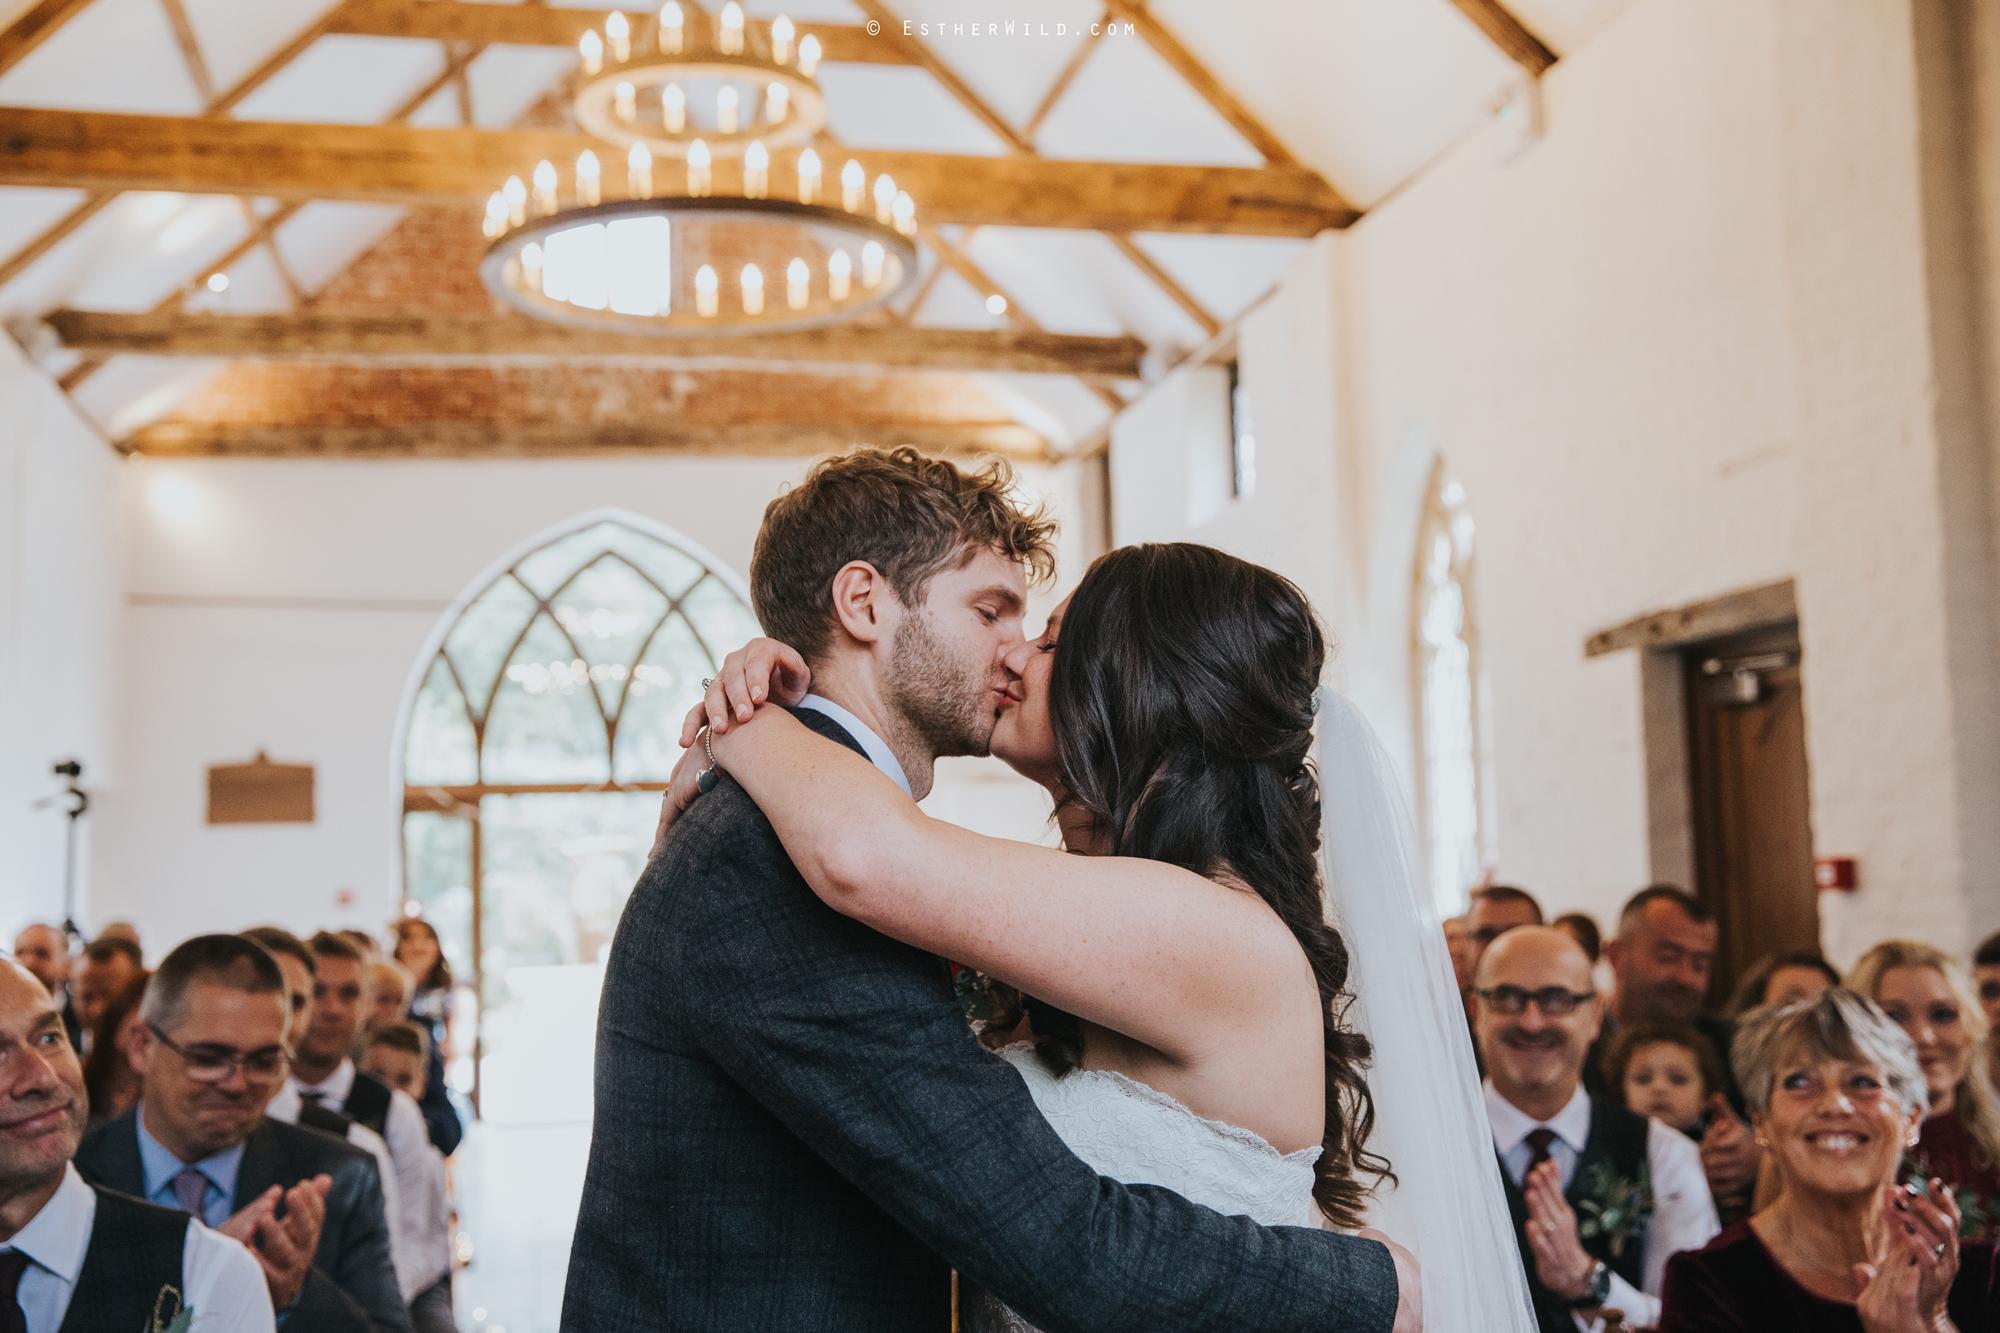 Reading_Room_Weddings_Alby_Norwich_Photographer_Esther_Wild_IMG_0968.jpg